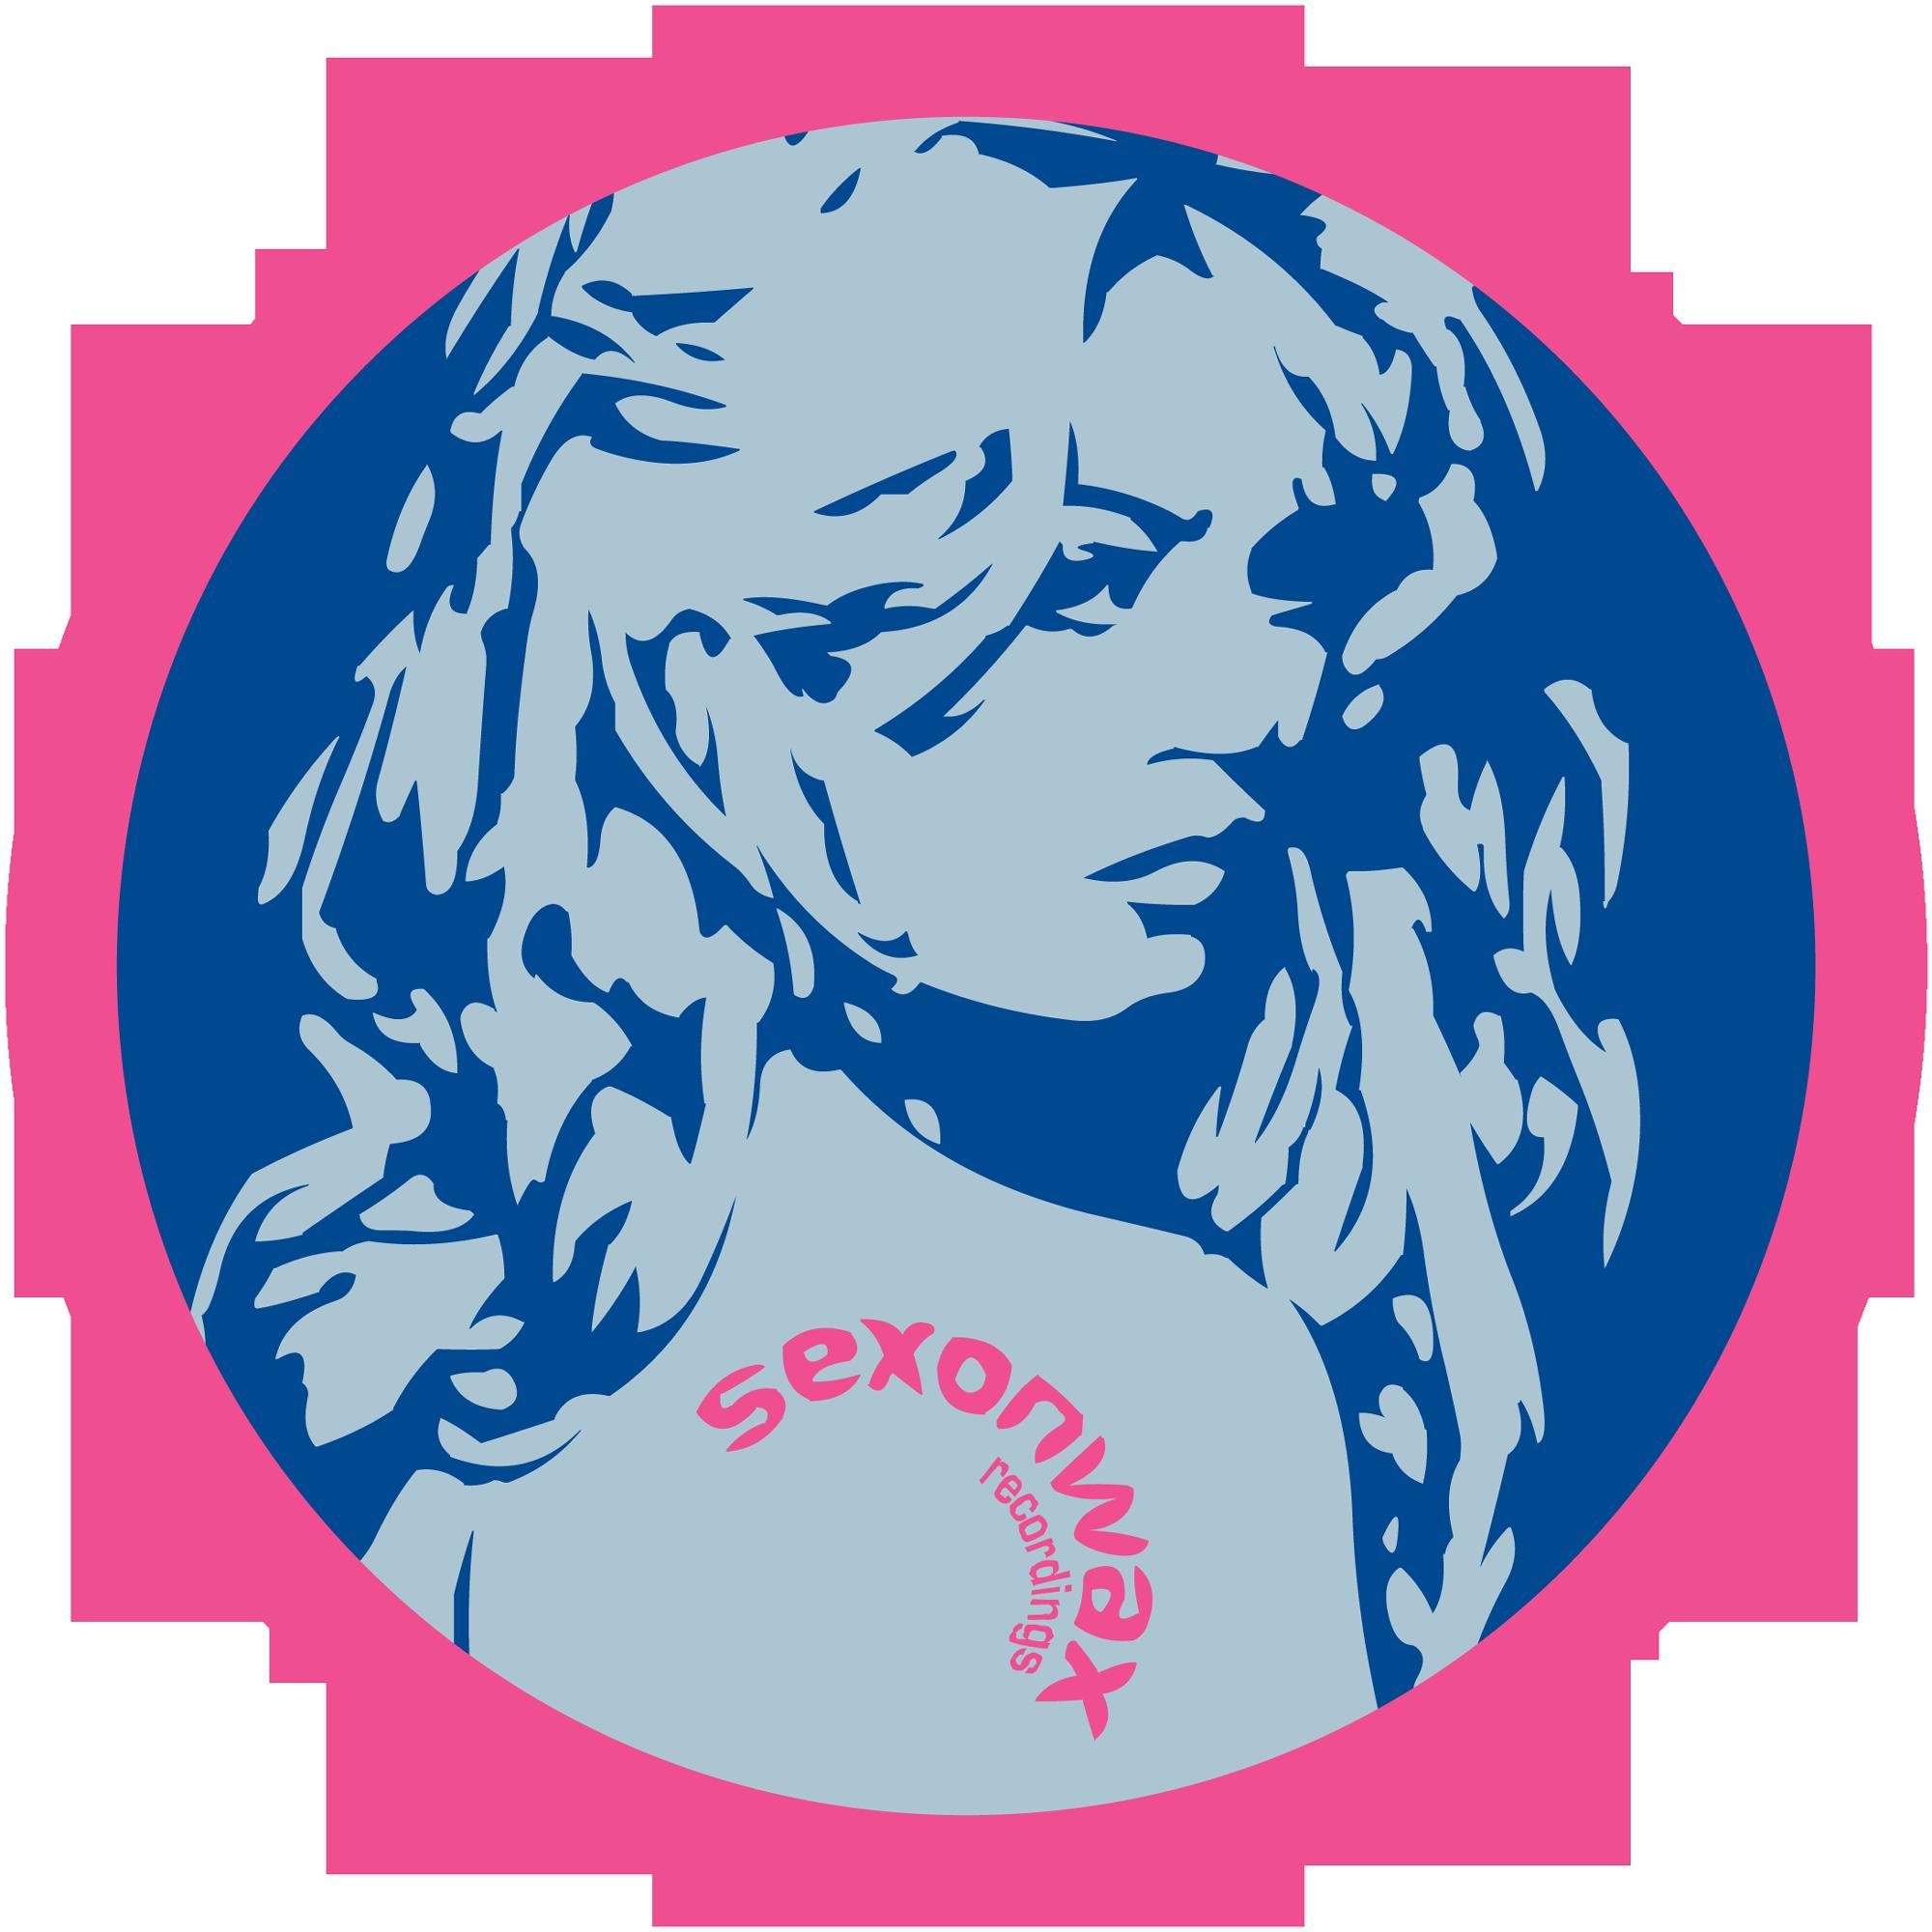 Sexonwax Recordings